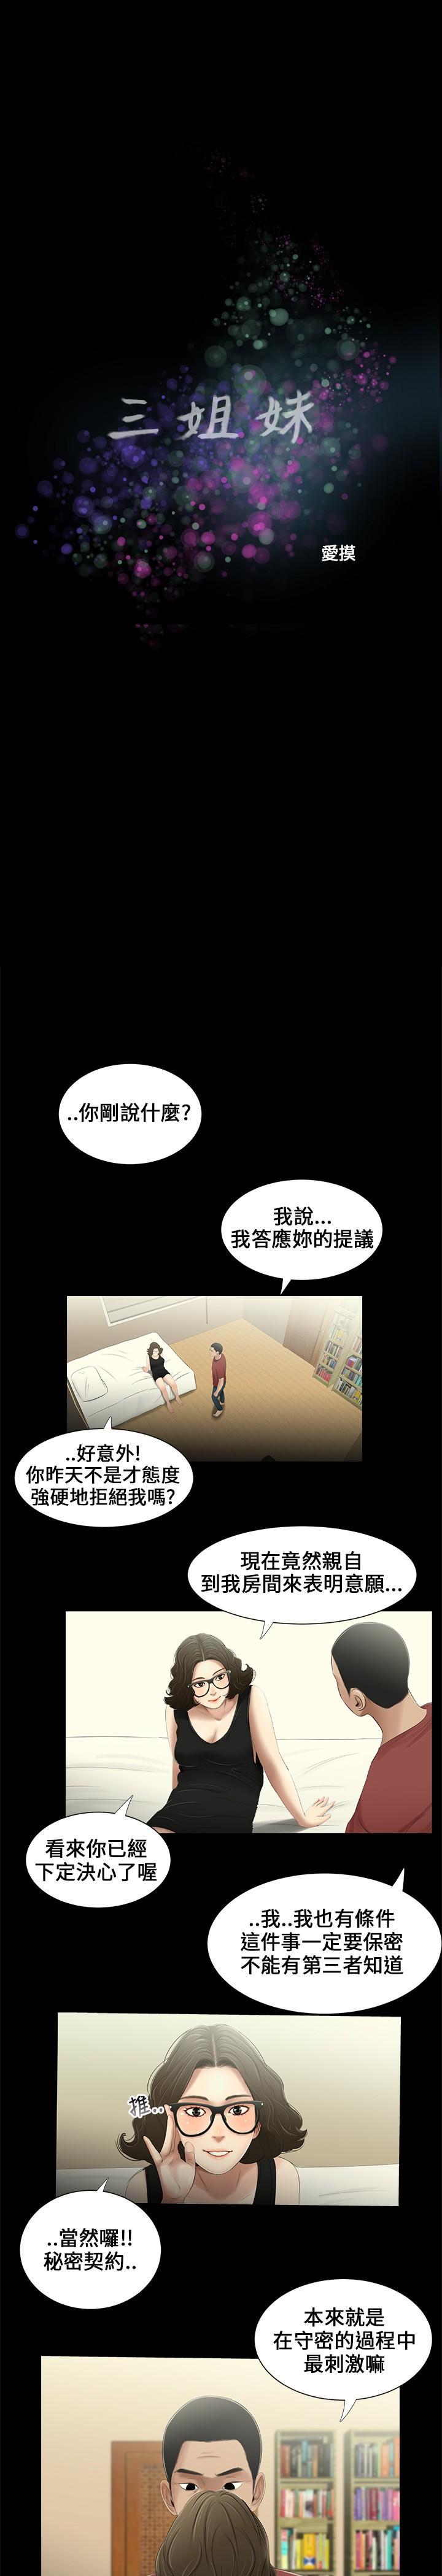 Three sisters 三姐妹Ch.13~19 (Chinese)中文 33